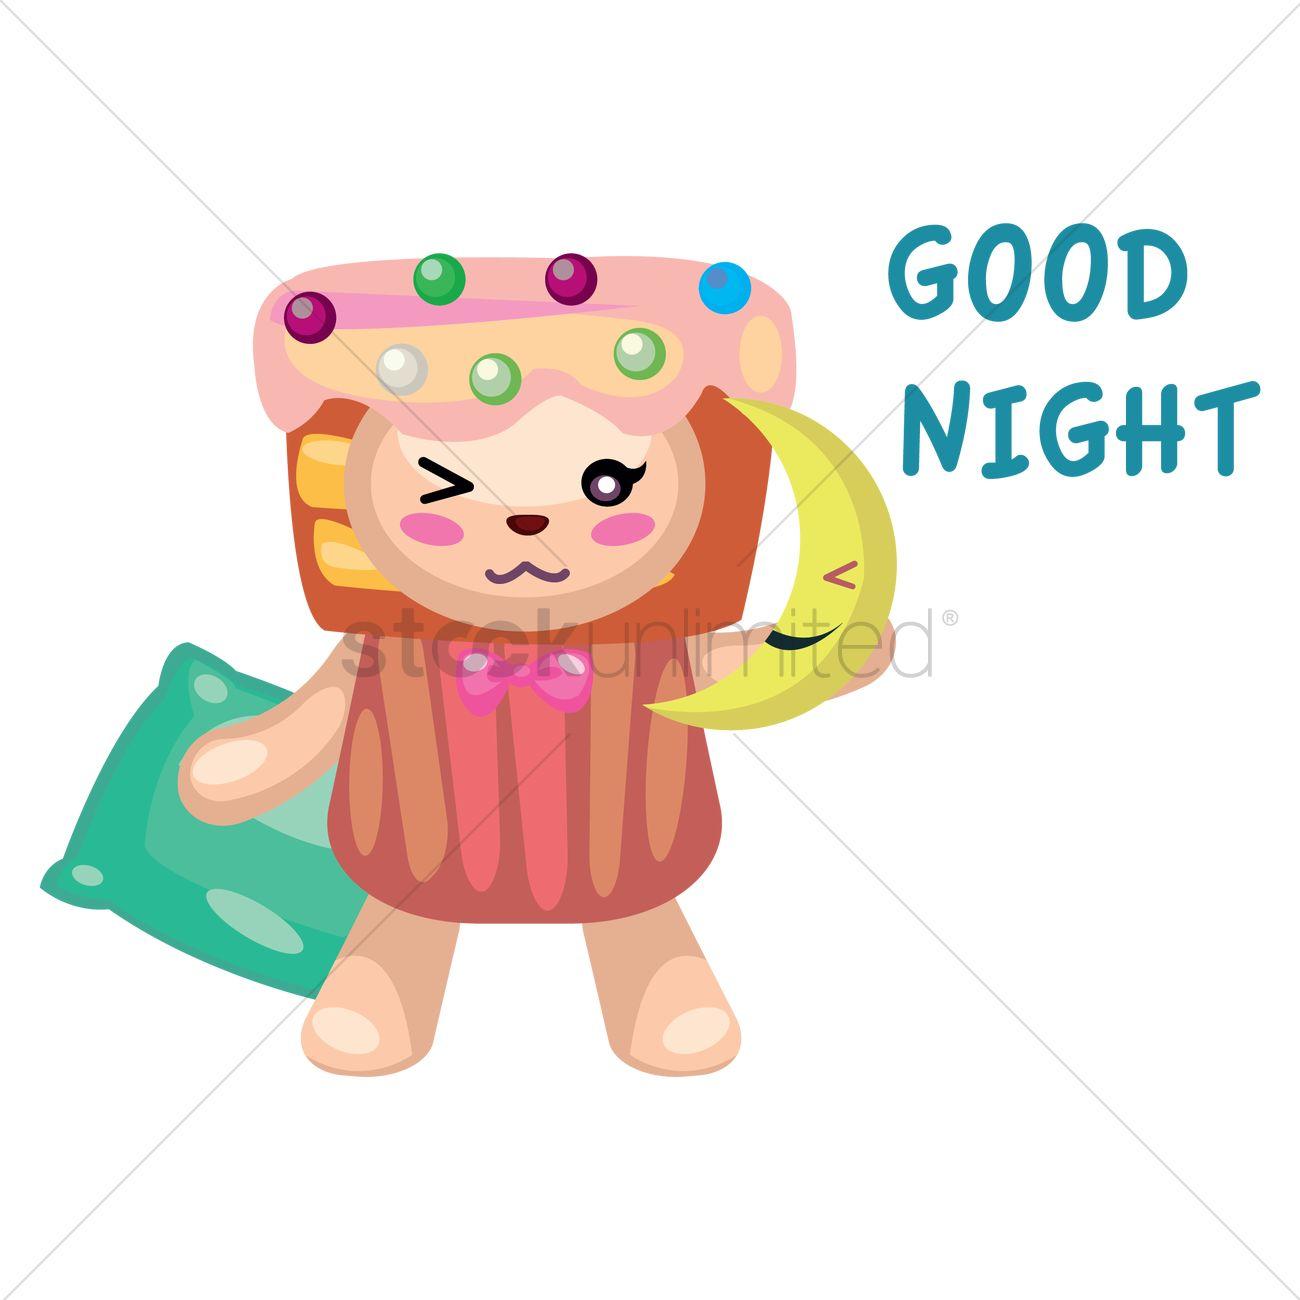 teddy bear in cupcake costume greeting good night vector image